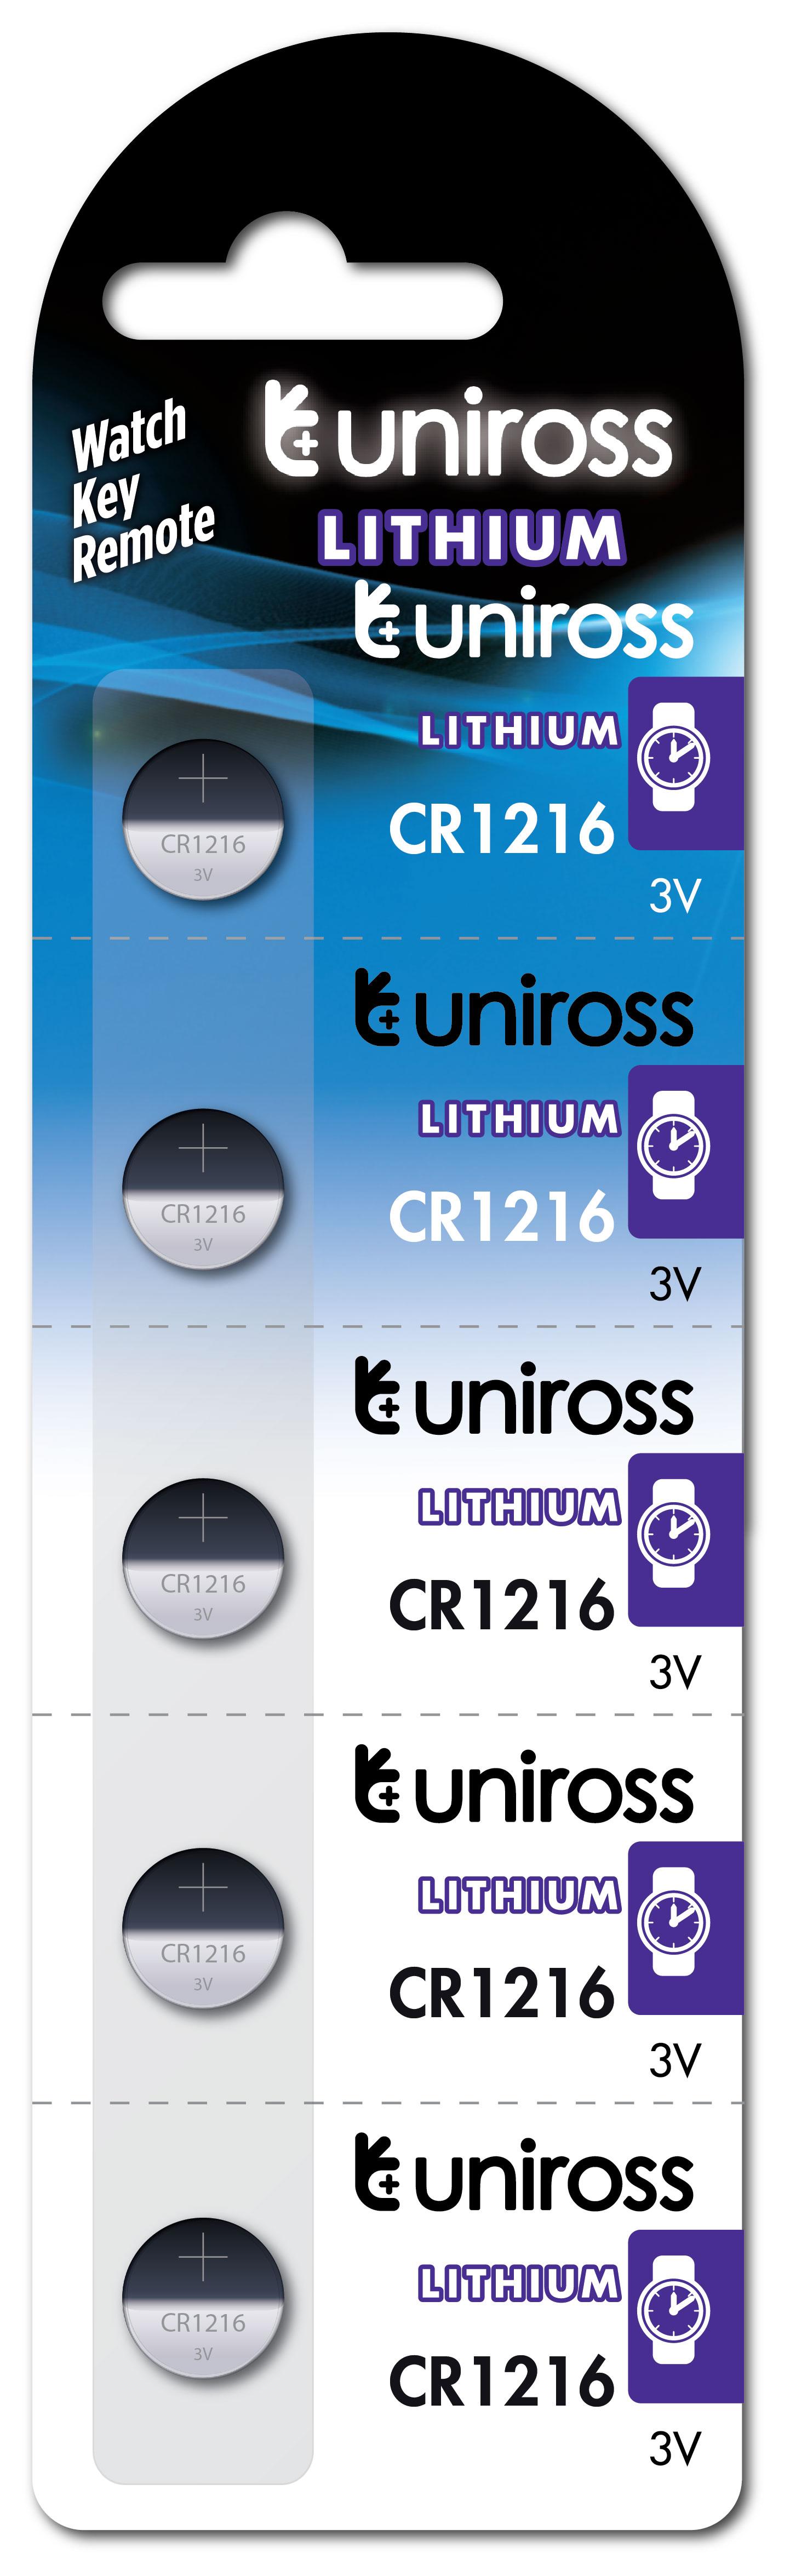 Button_Cell_[U5CR1216] UNIROSS BP5 CR1216 LITHIUM.jpg